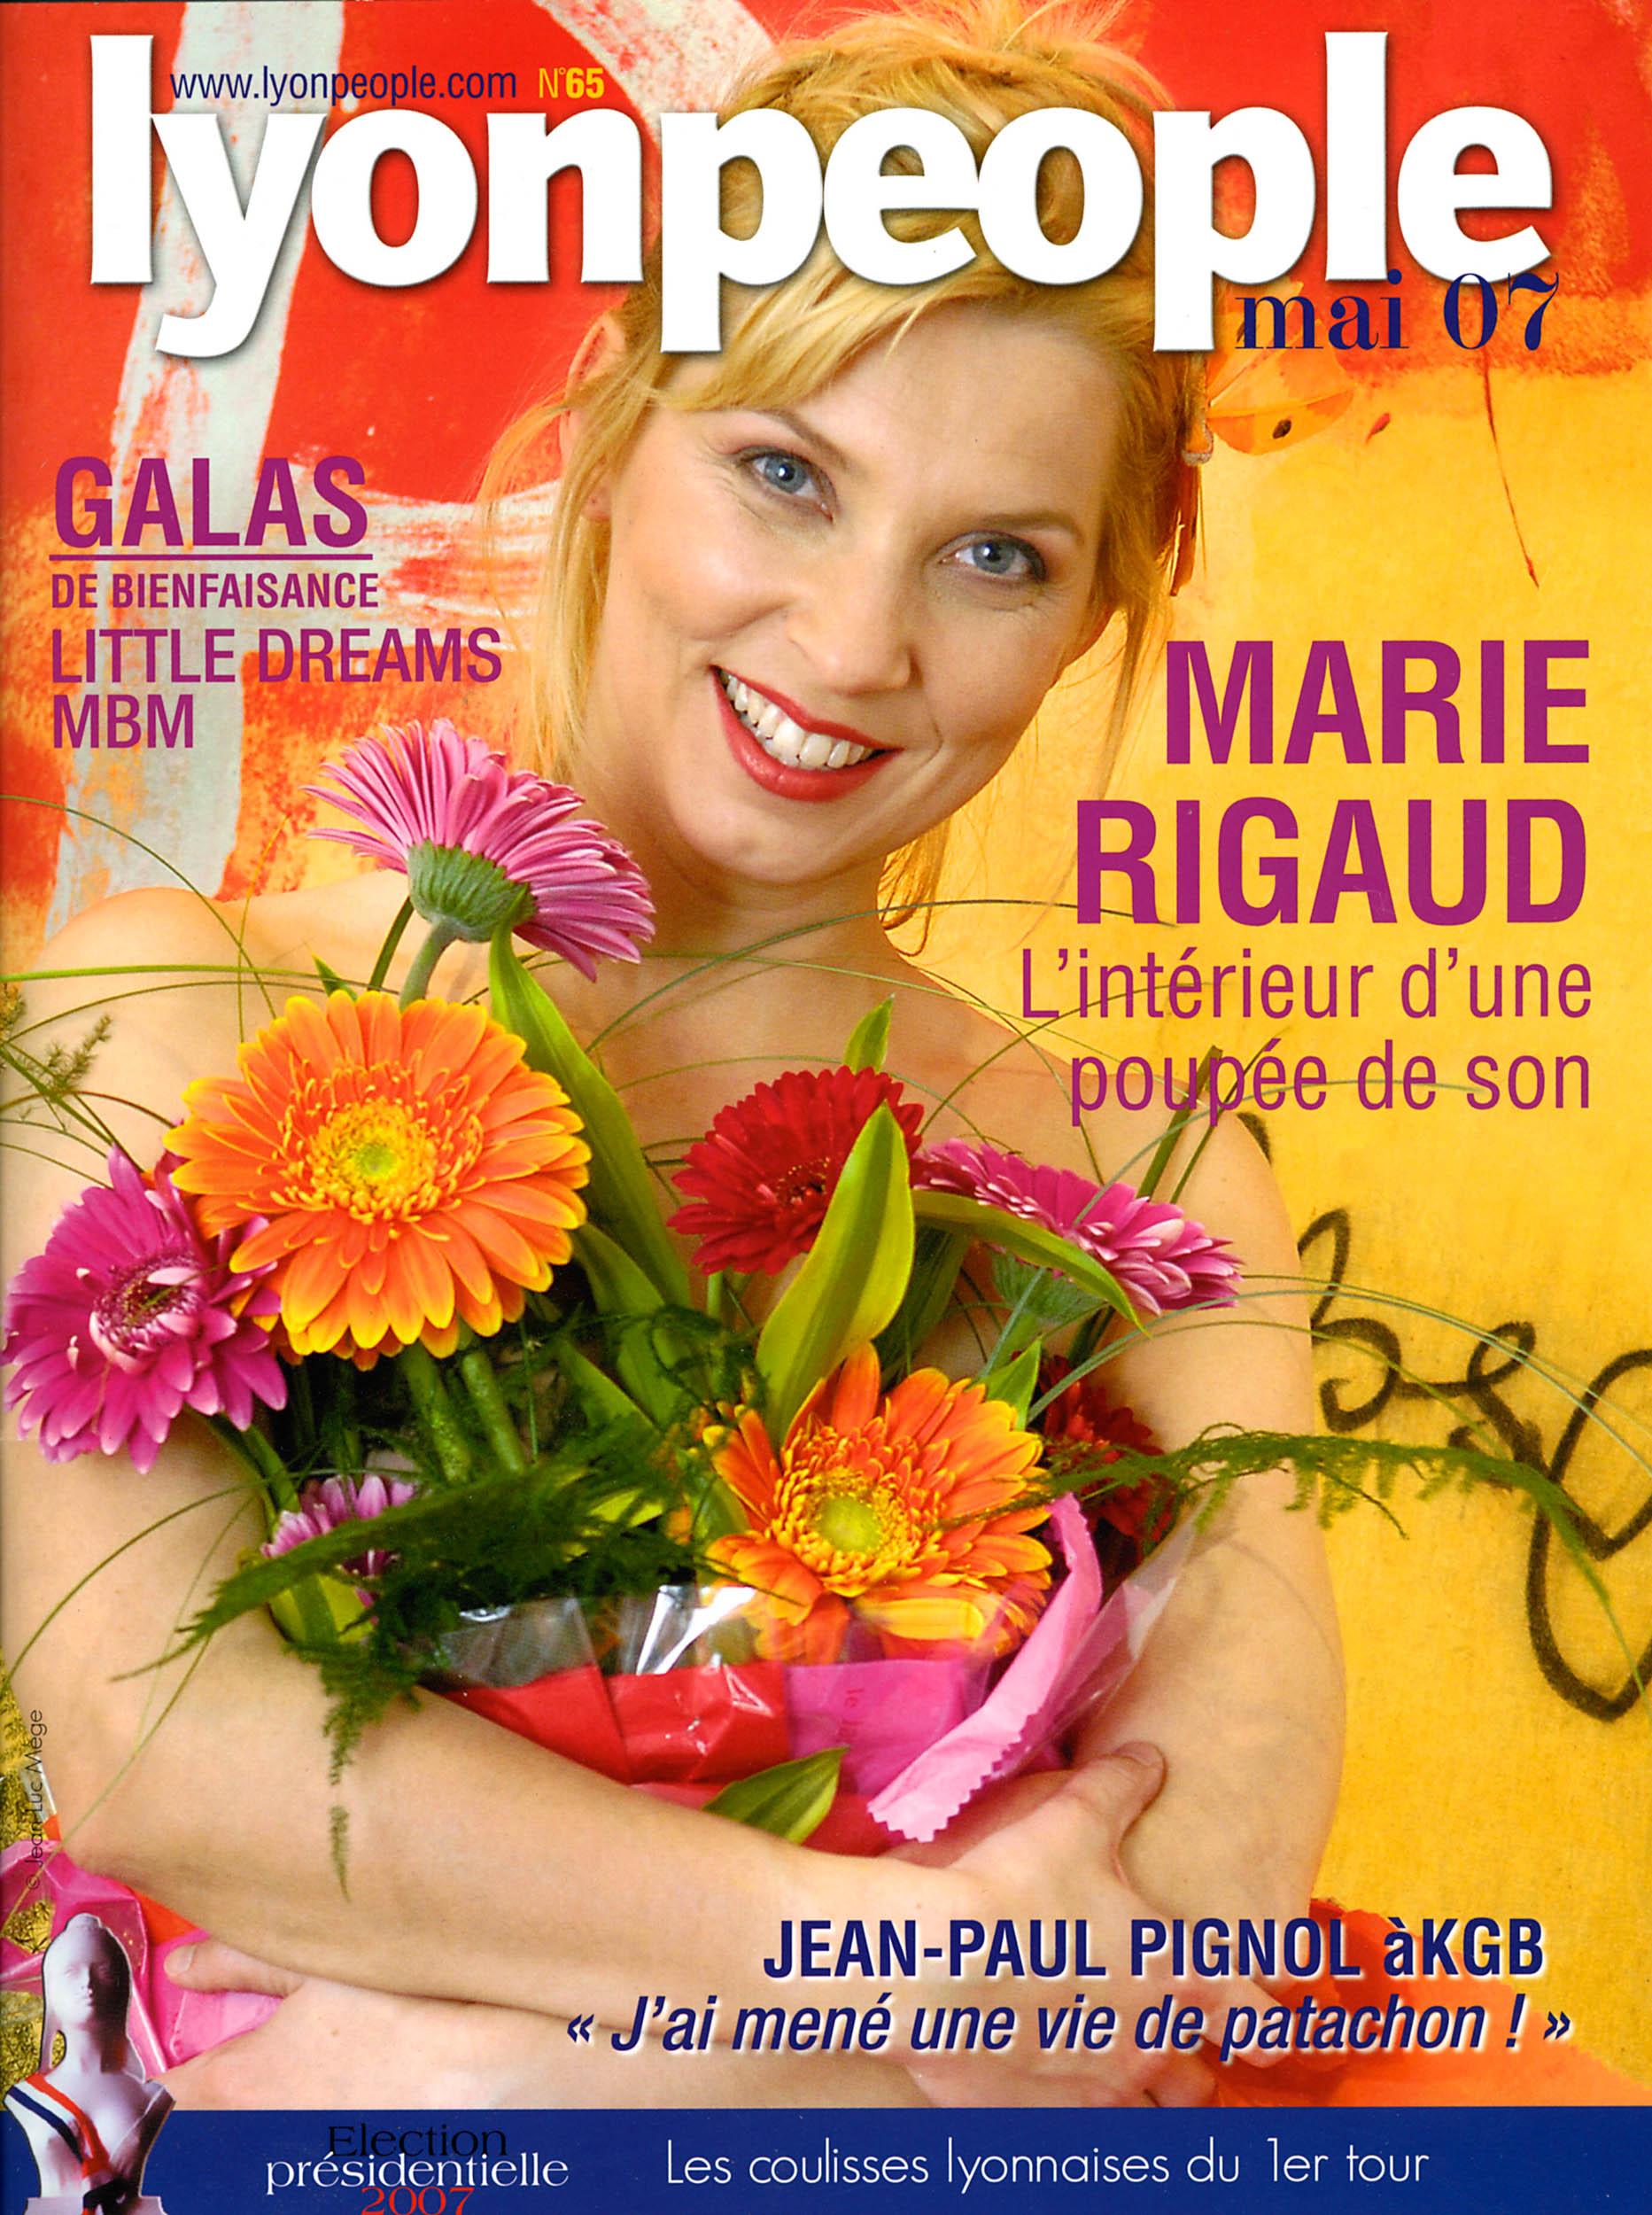 Marie Rigaud mai 07-8.jpg